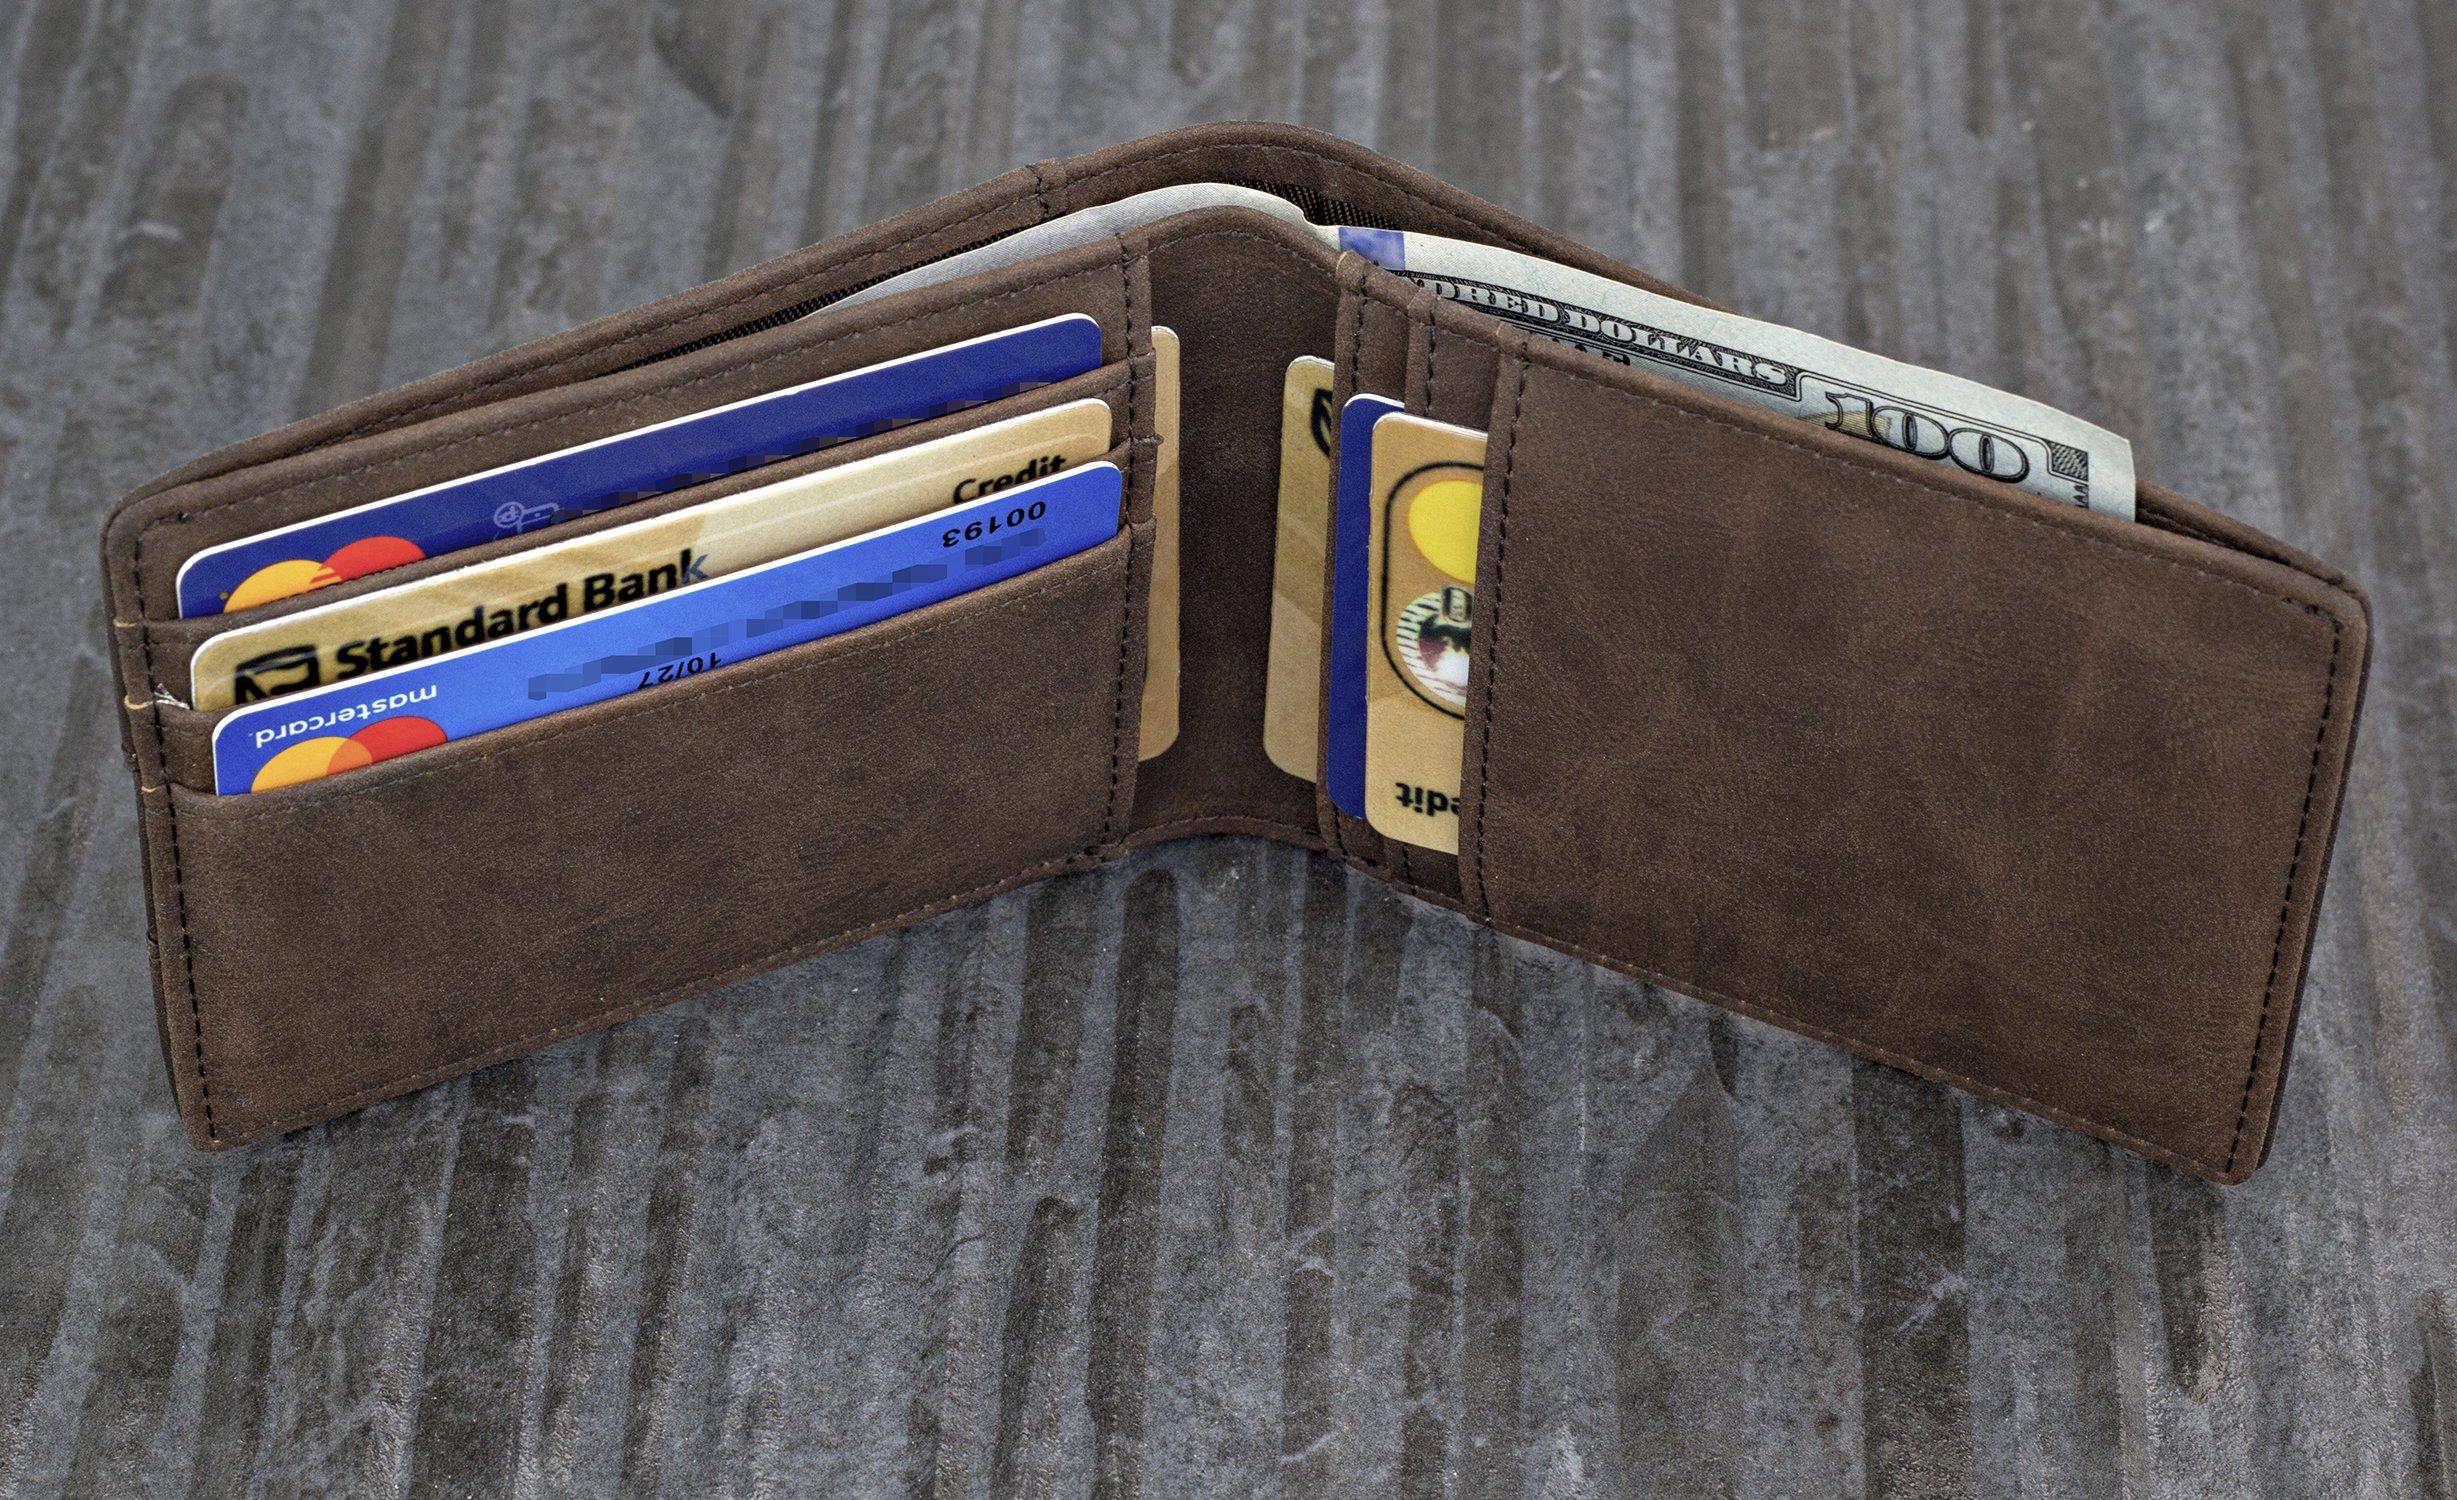 TRAVANDO Slim Wallets BUFFALO - RFID Blocking Wallet - 8 Card Pockets - Mini Credit Card Holder - Travel Wallet - Minimalist Bifold Wallet for Men with Gift Box by Travando (Image #3)